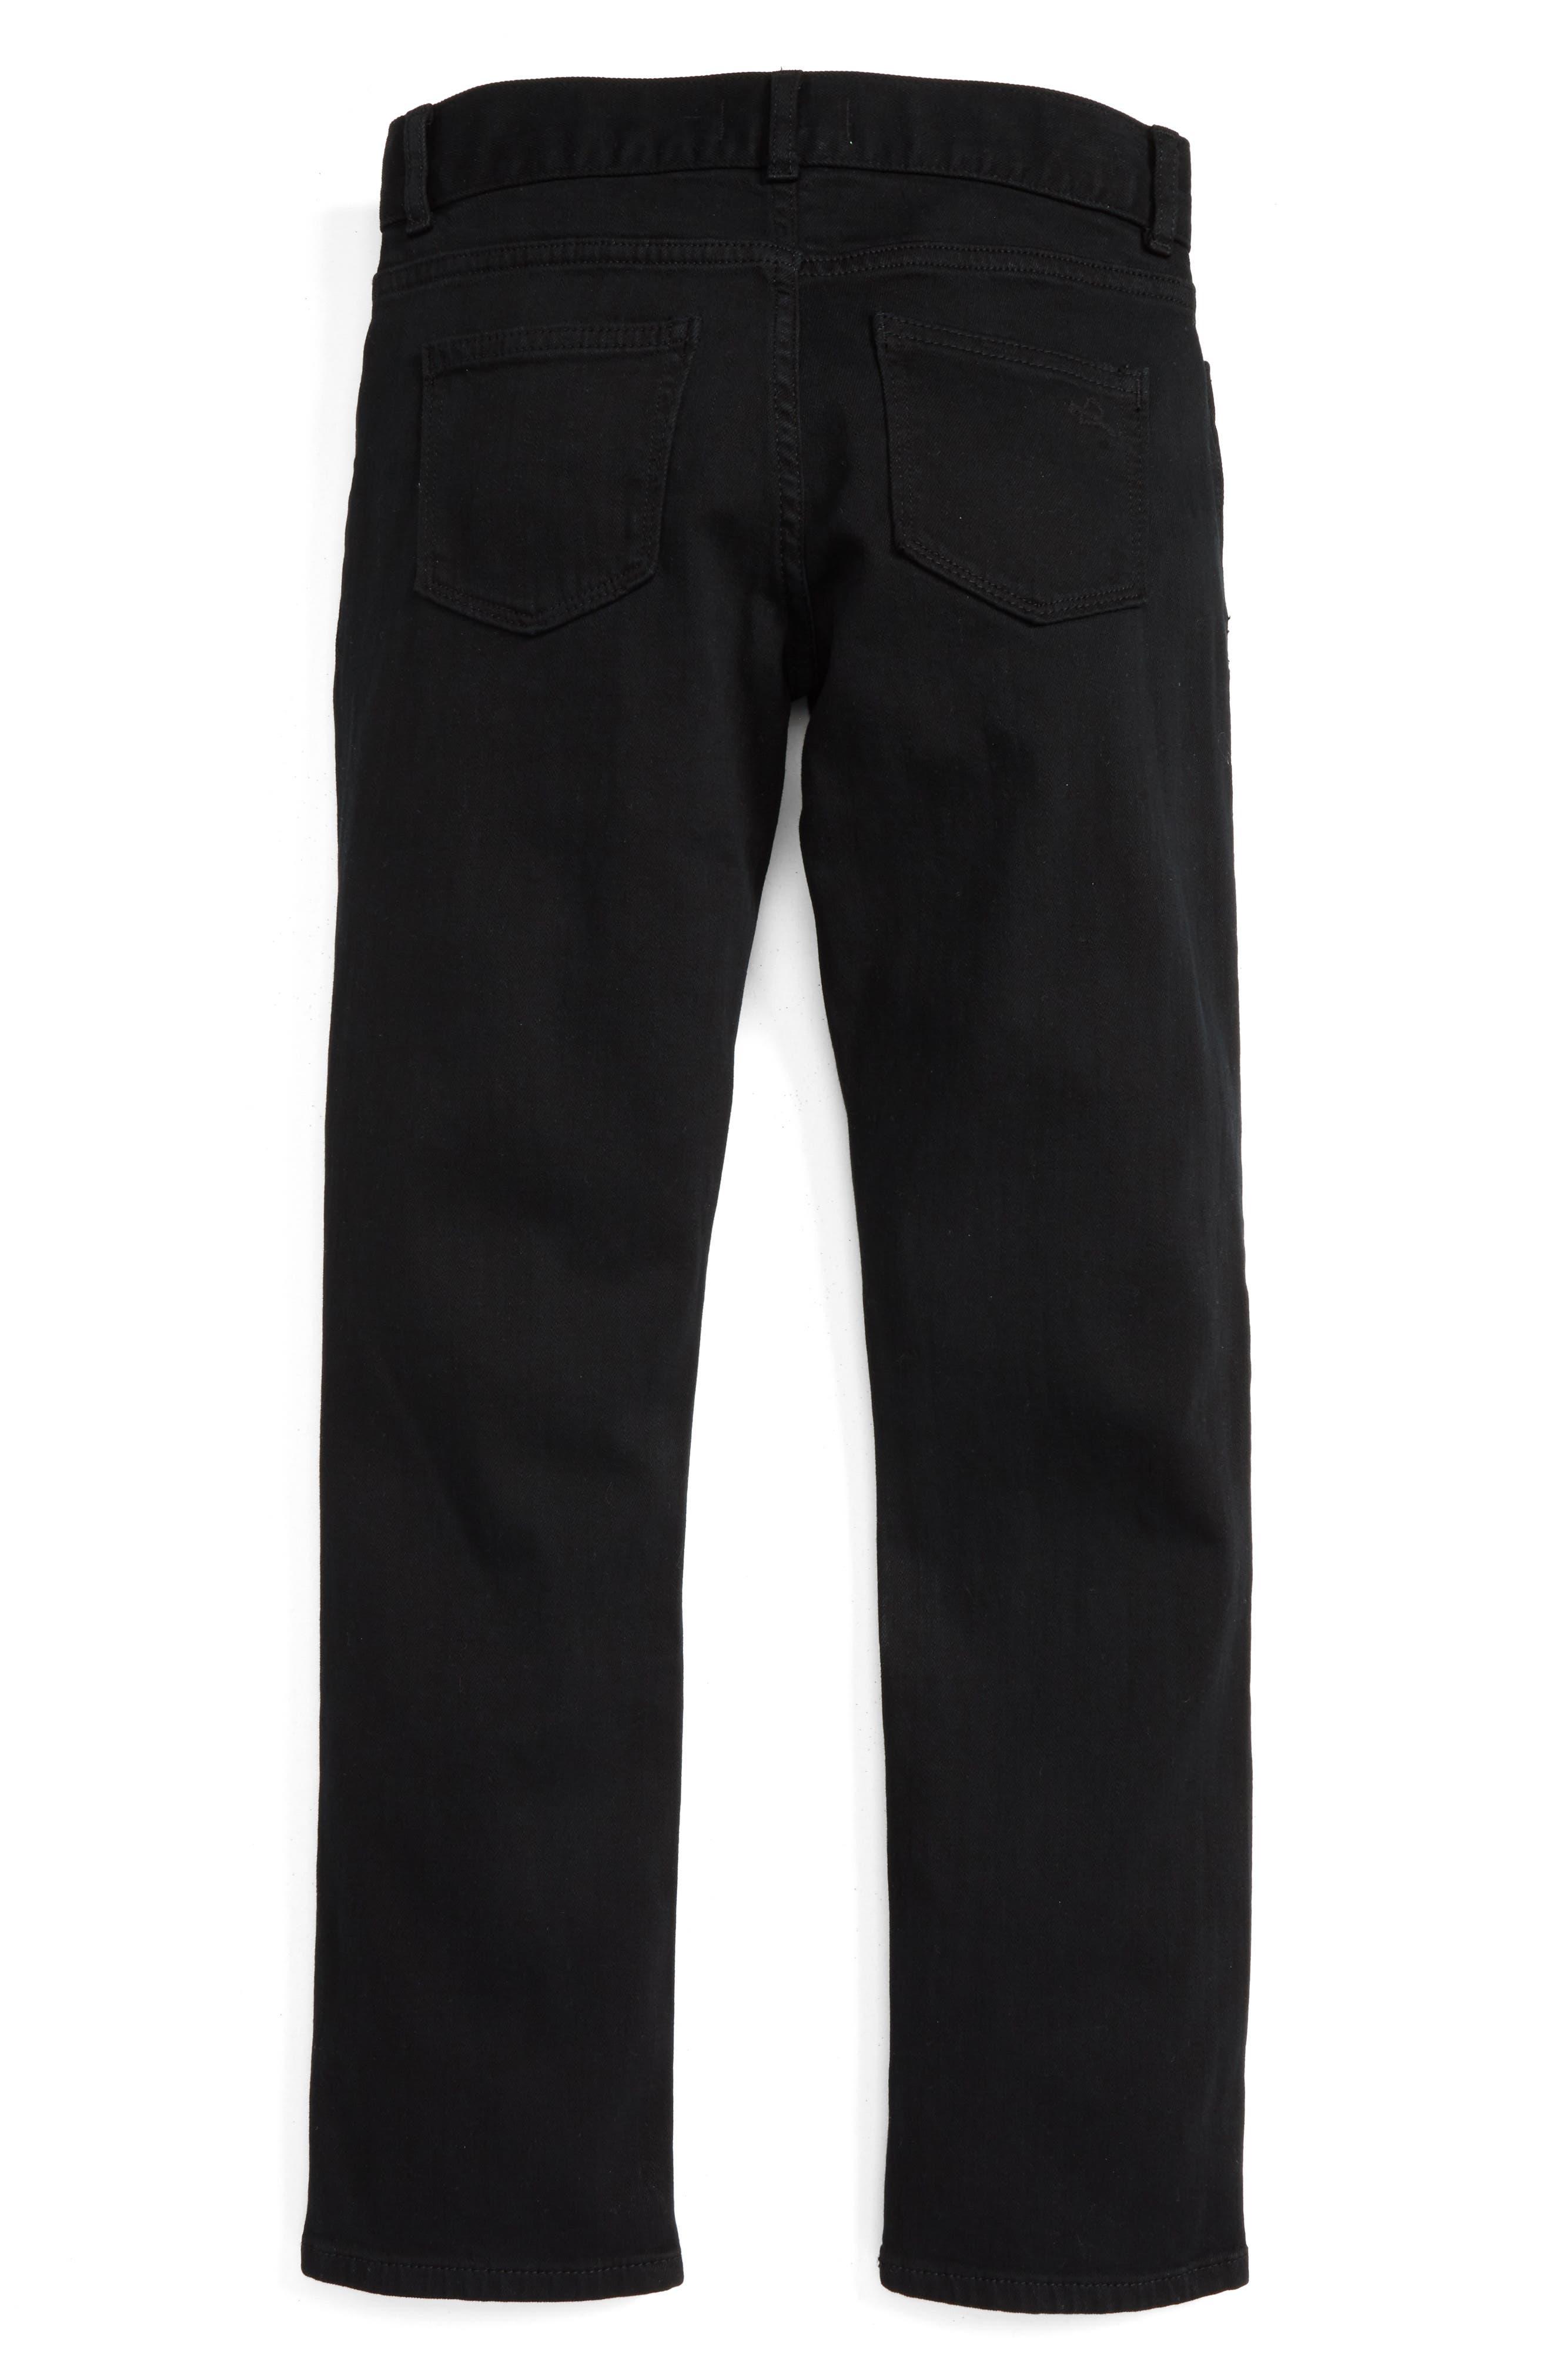 Brady Slim Fit Jeans,                             Main thumbnail 1, color,                             BLACK